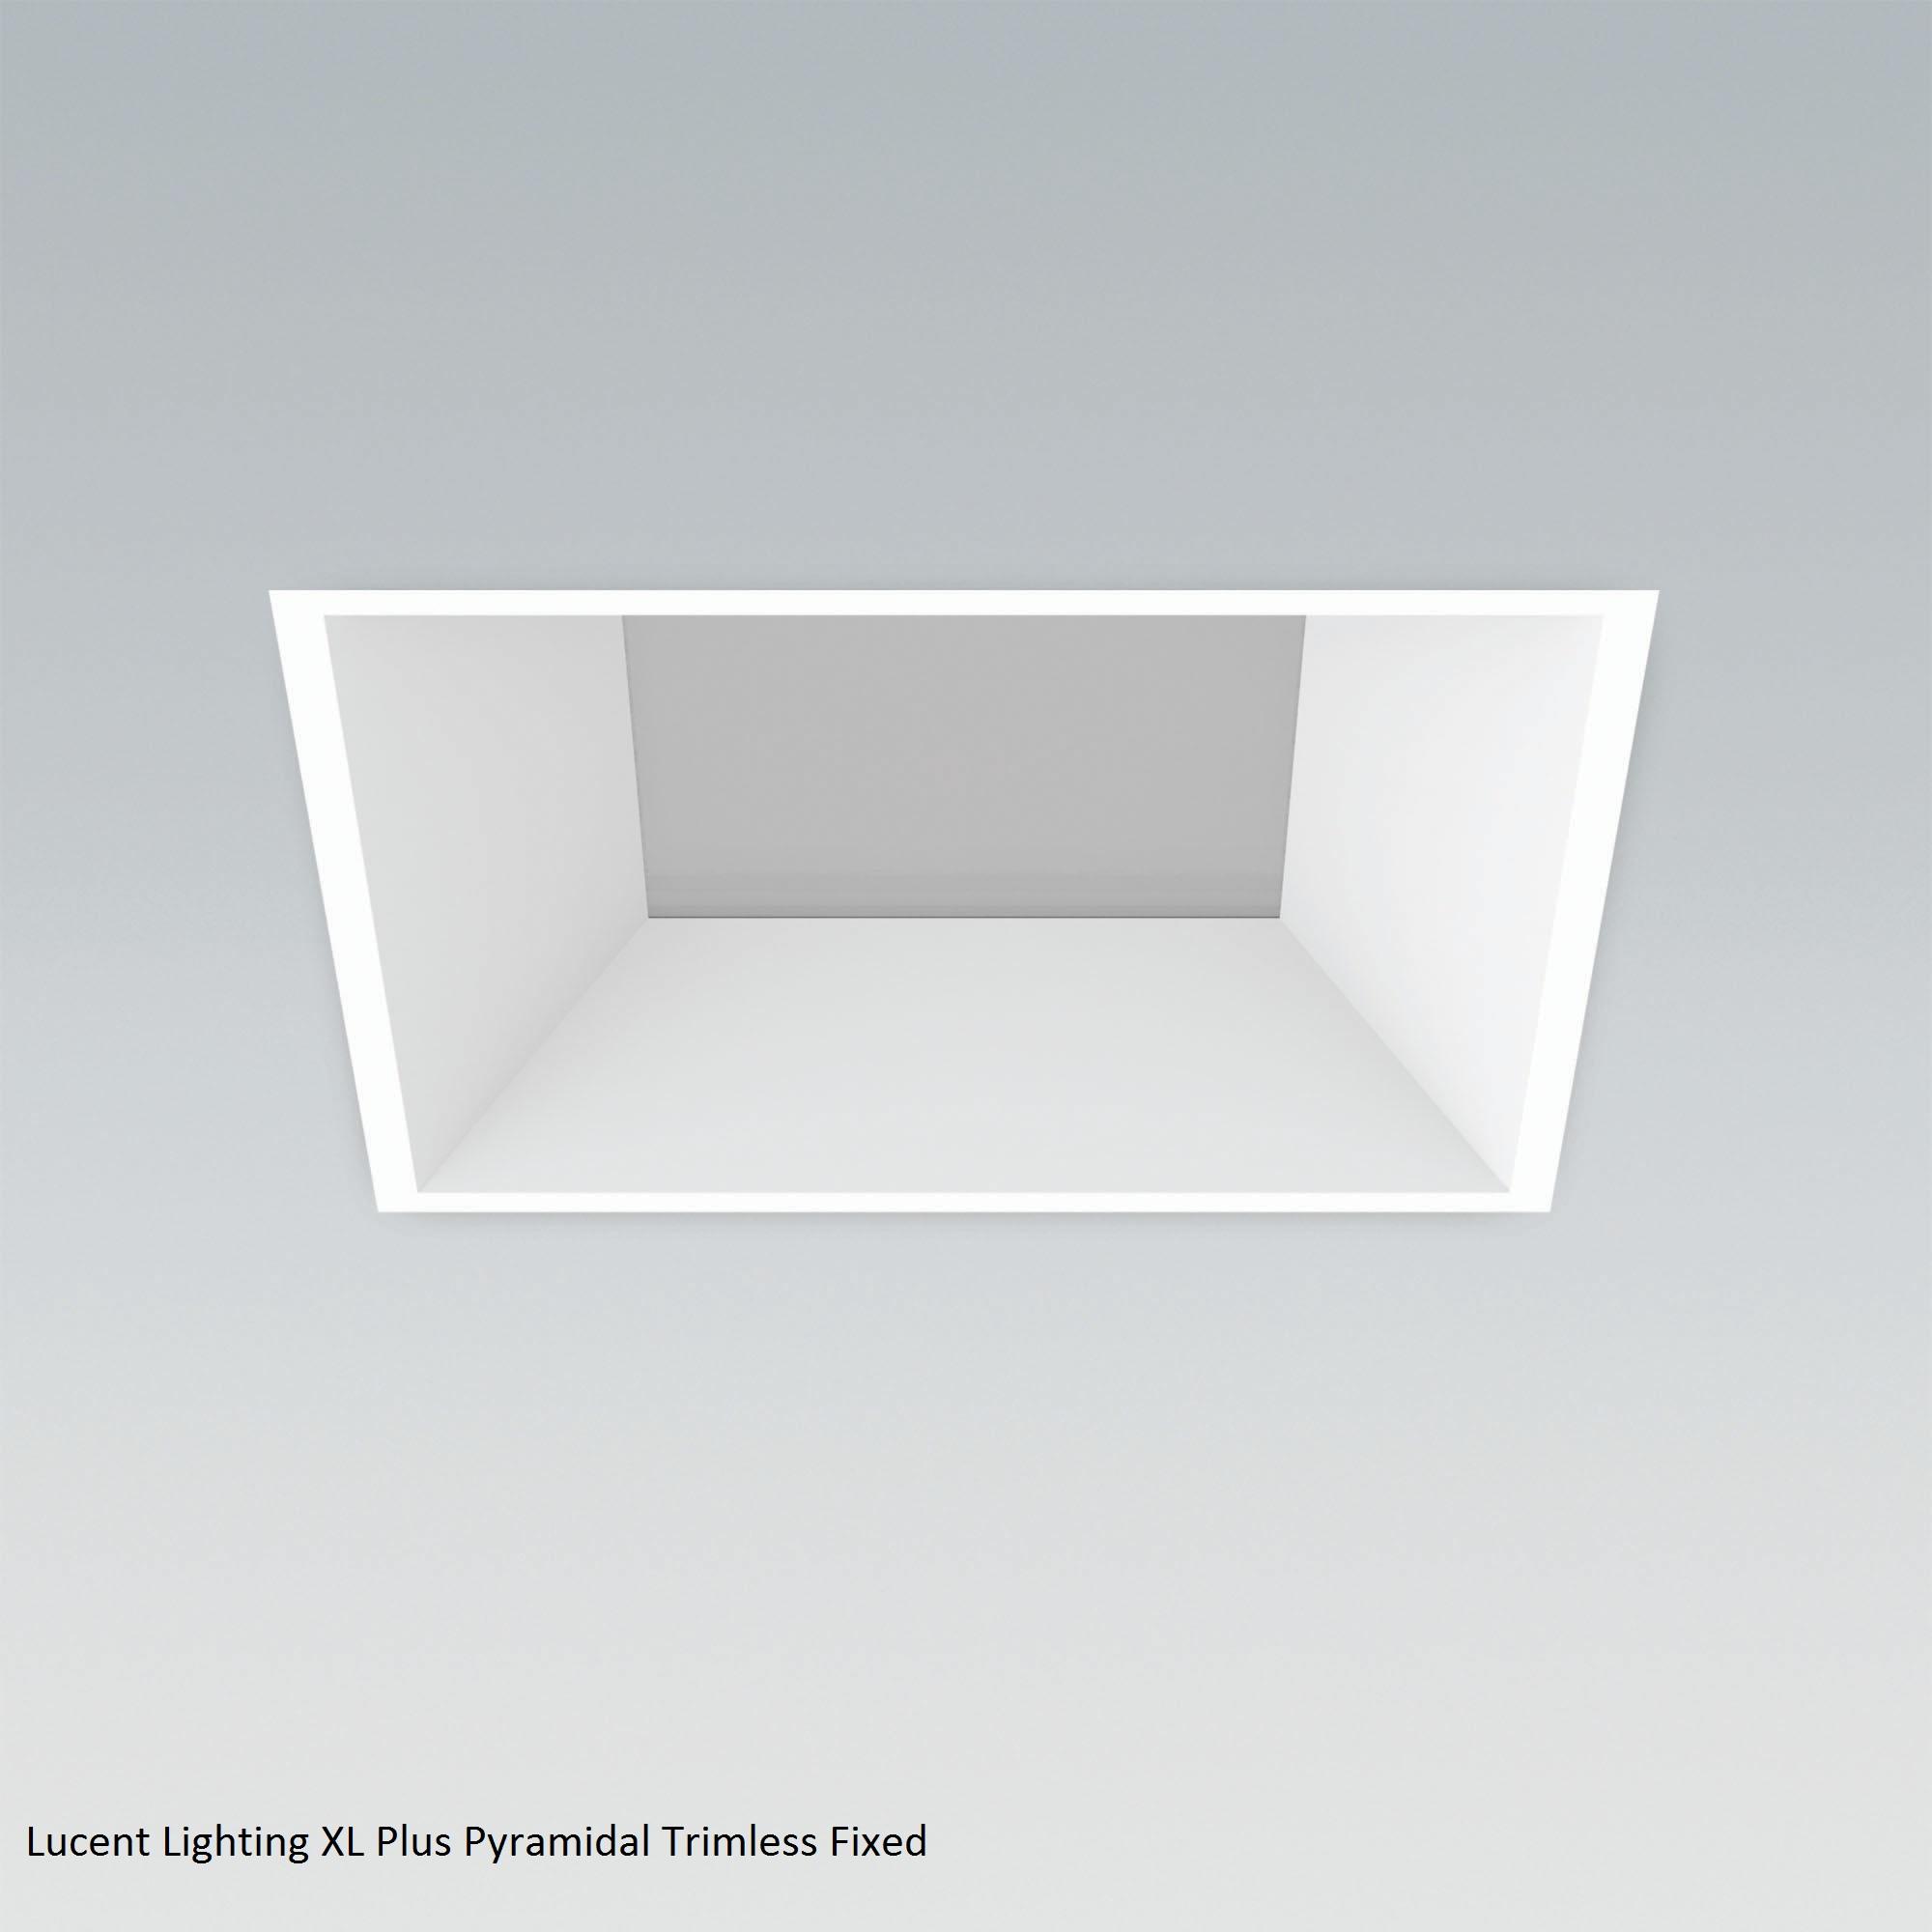 lucent-lighting-plus-xl-pyramidal-trimless-fixed-1